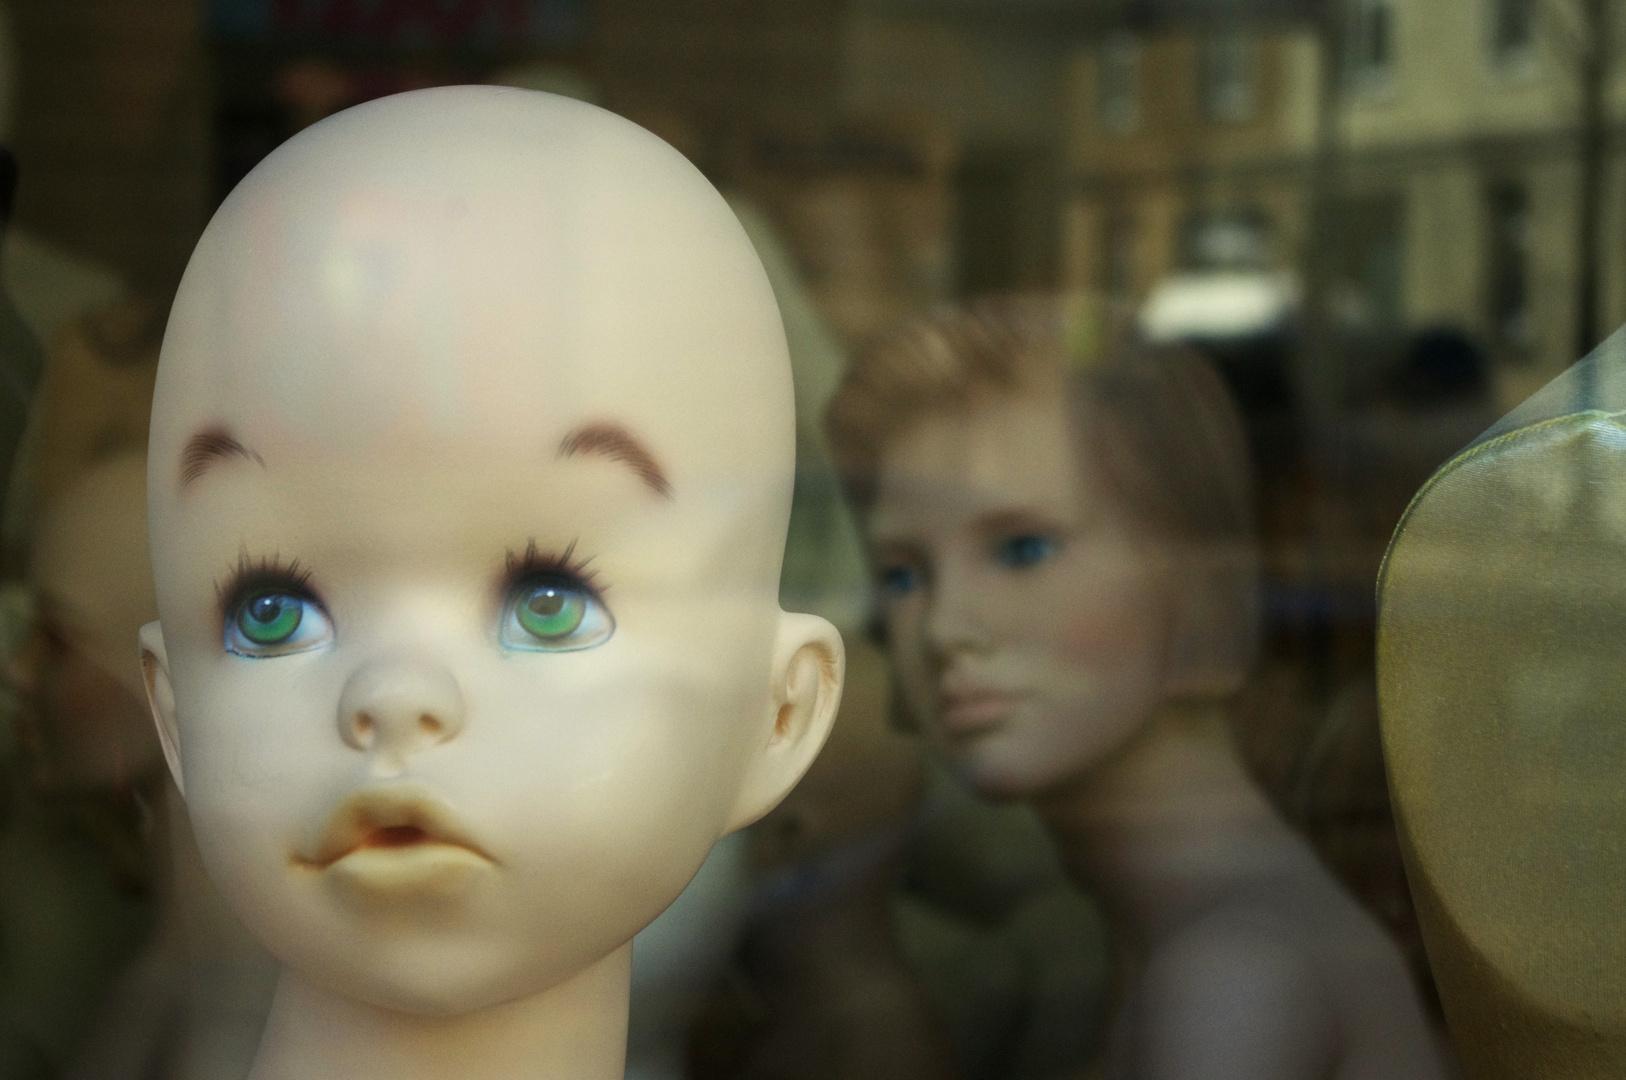 Baby dolls unkown future